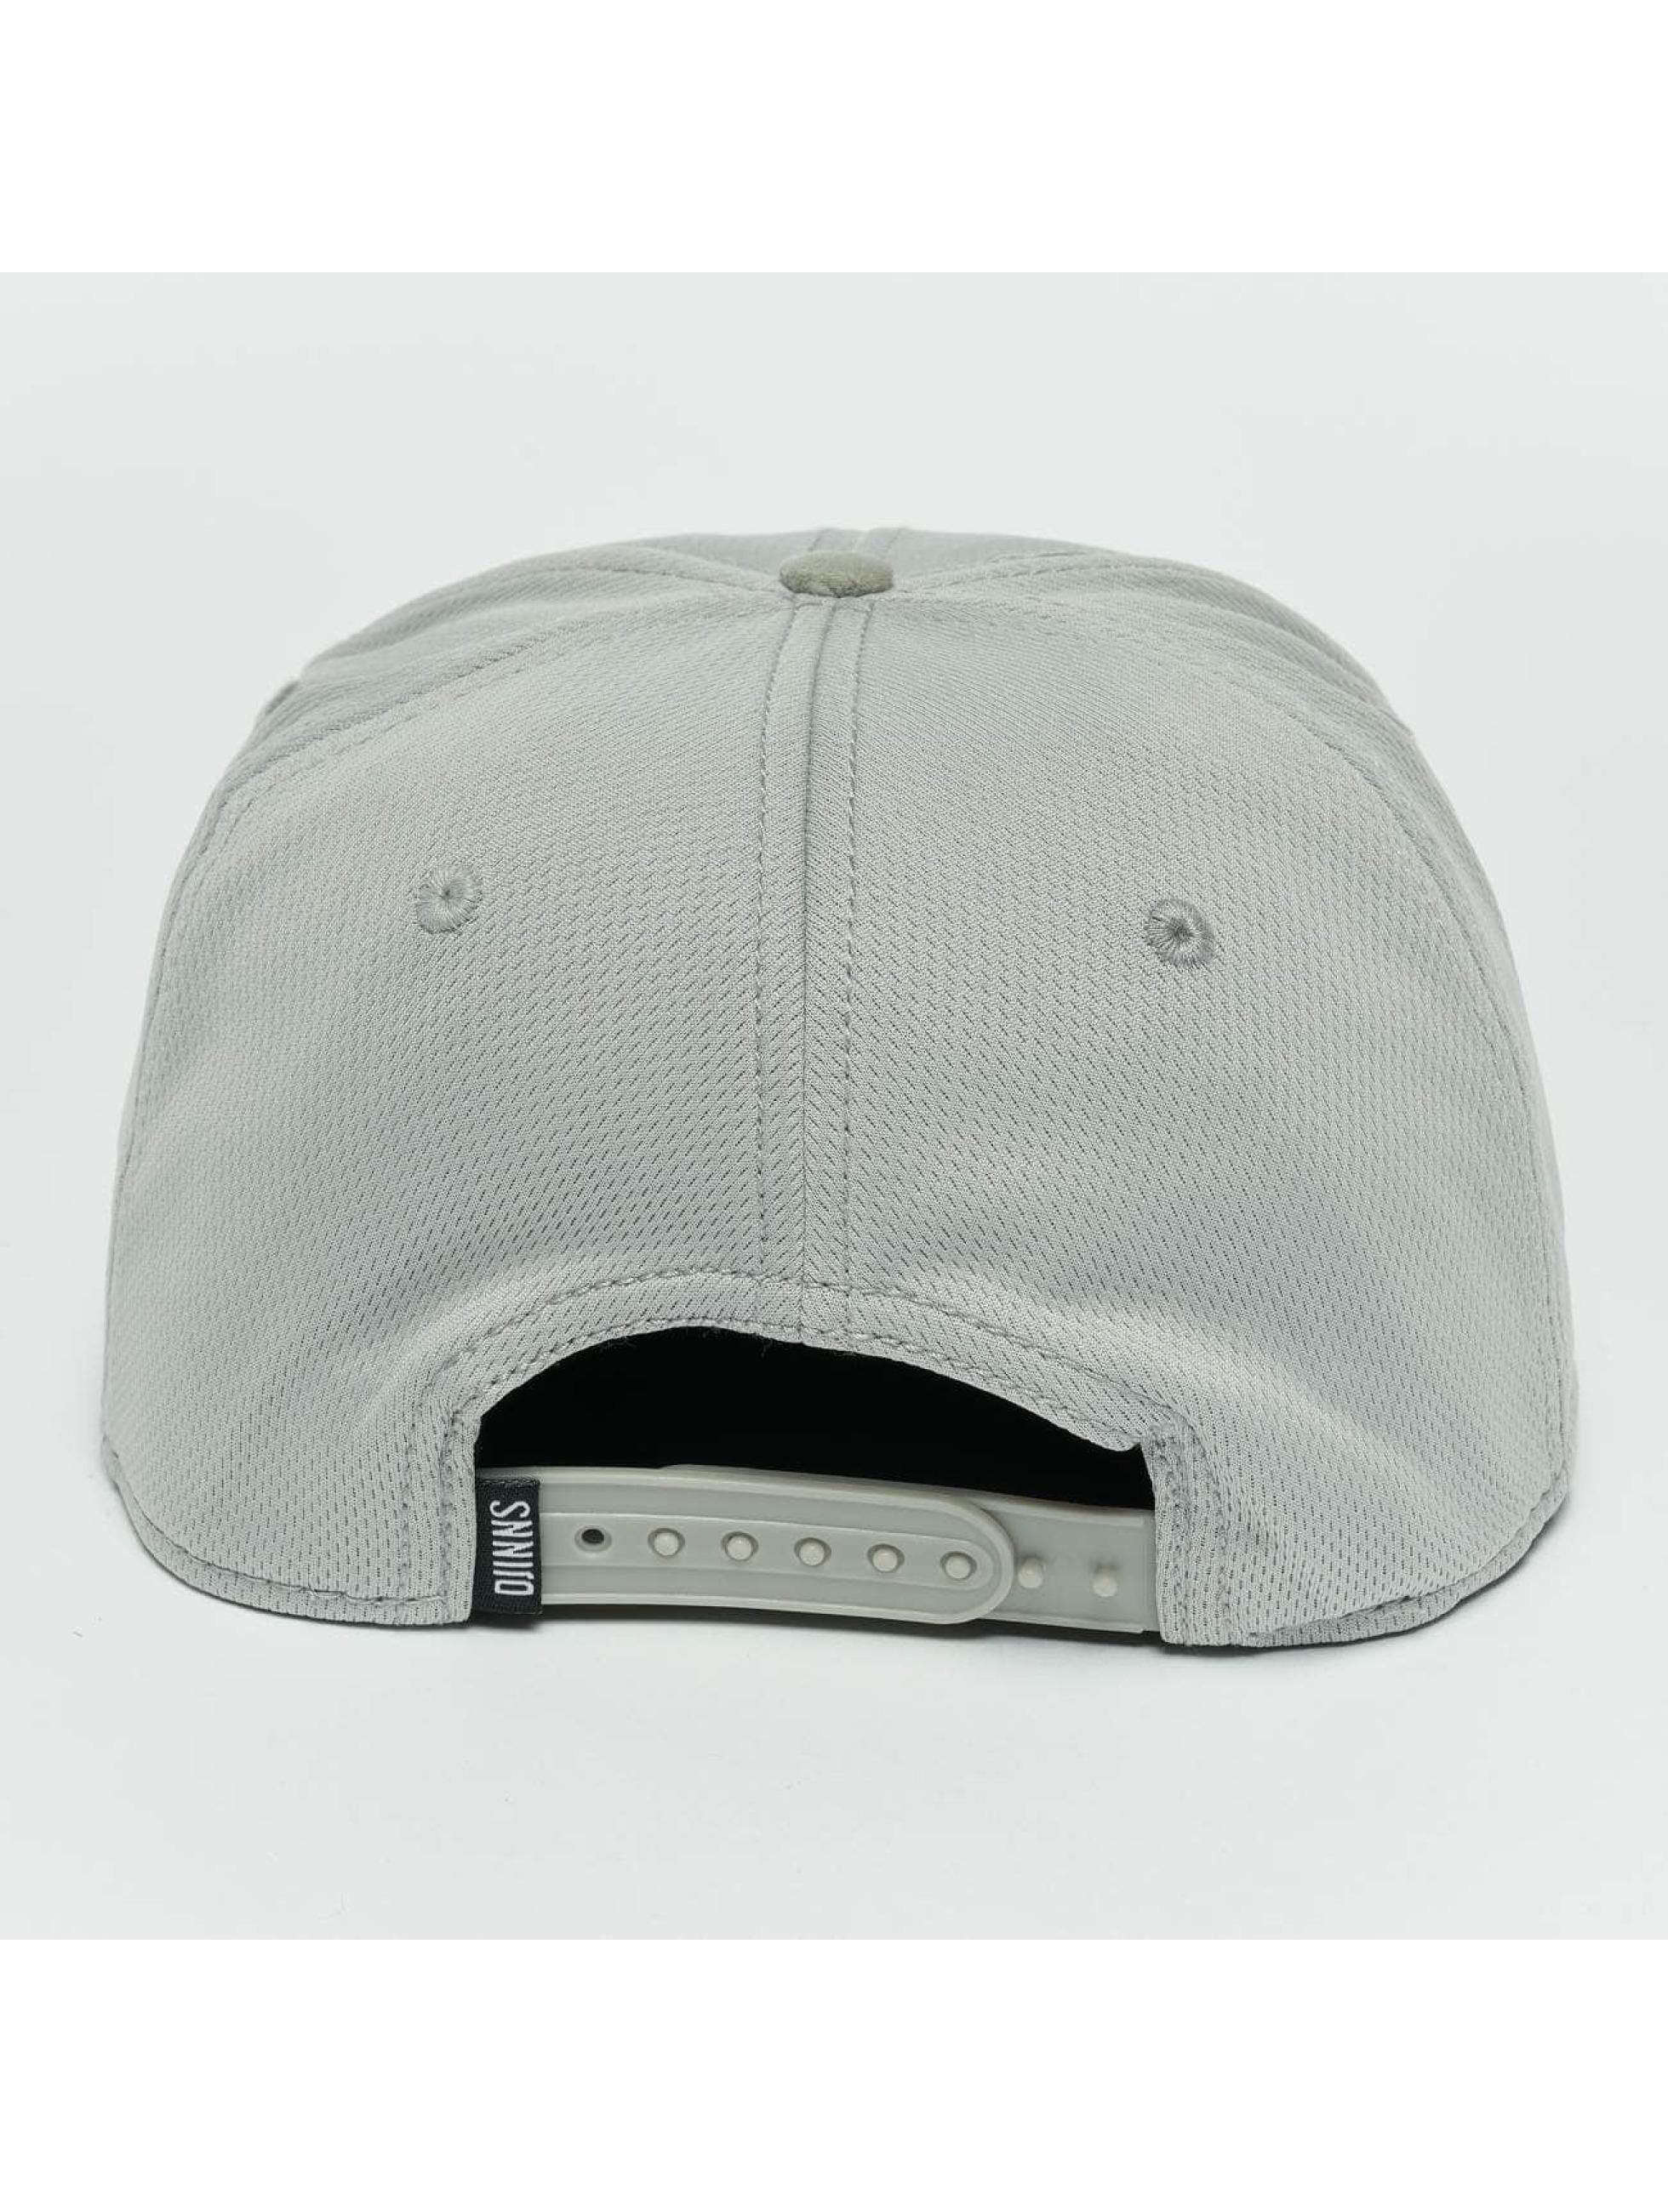 Djinns Casquette Snapback & Strapback Dry Knt gris